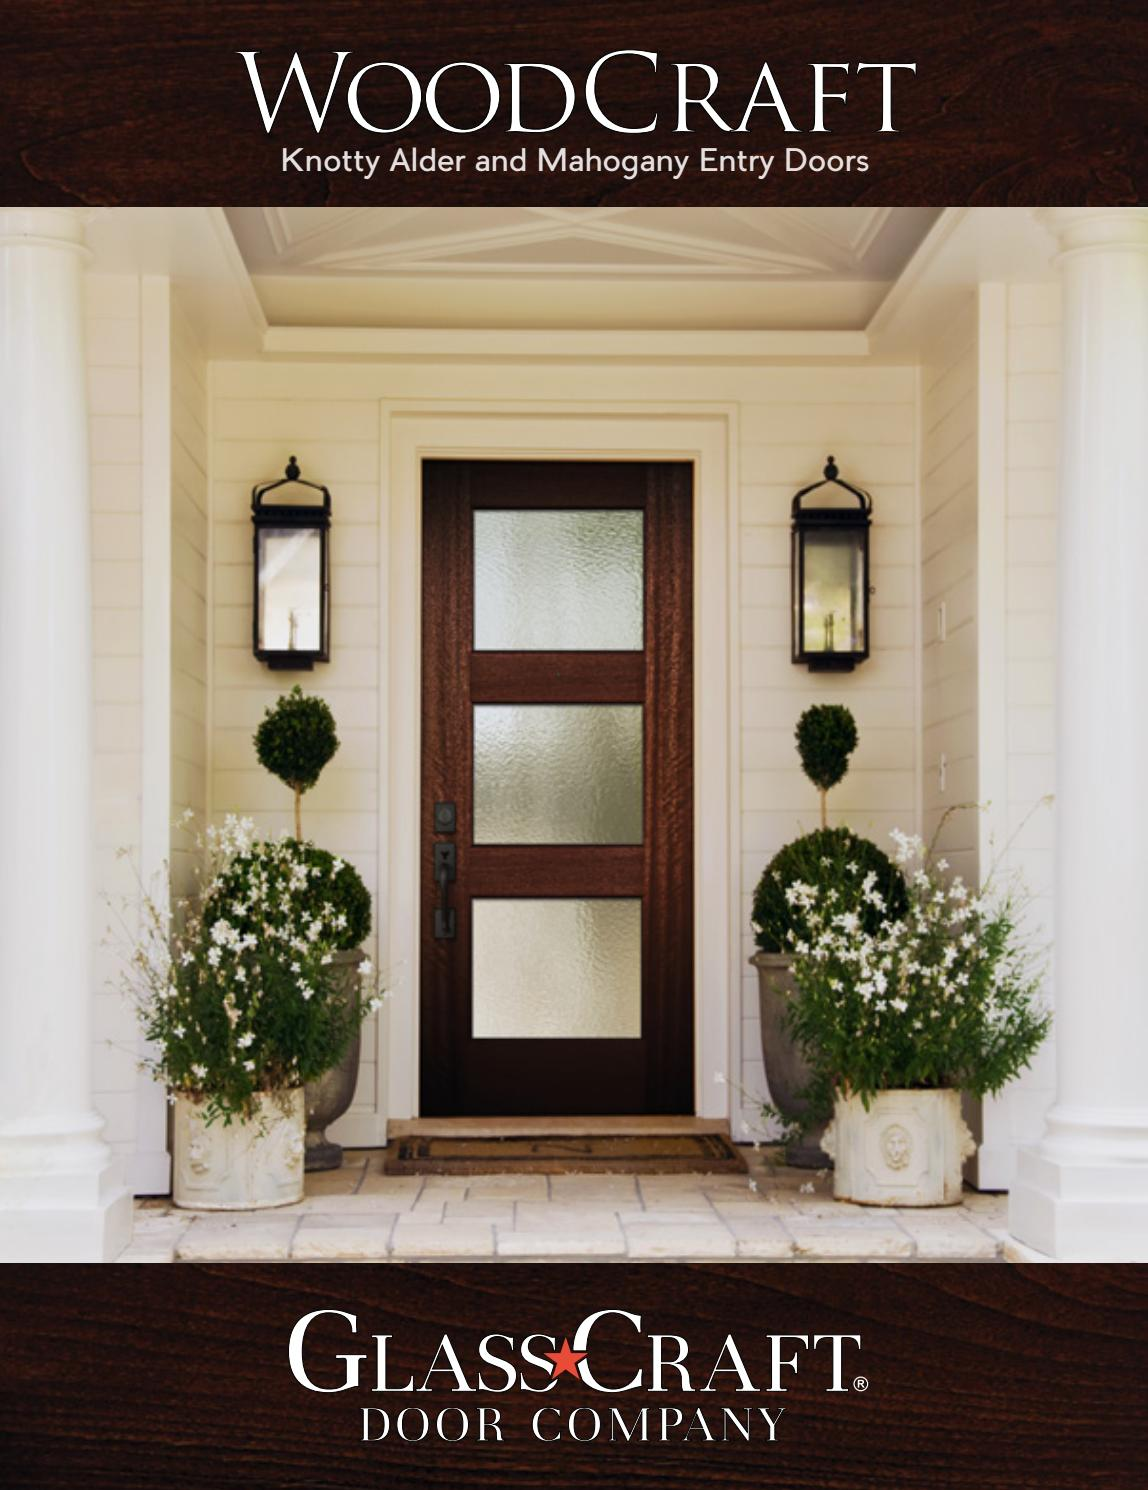 WoodCraft Mahogany U0026 Knotty Alder Entry Doors Catalog By GlassCraft   Issuu